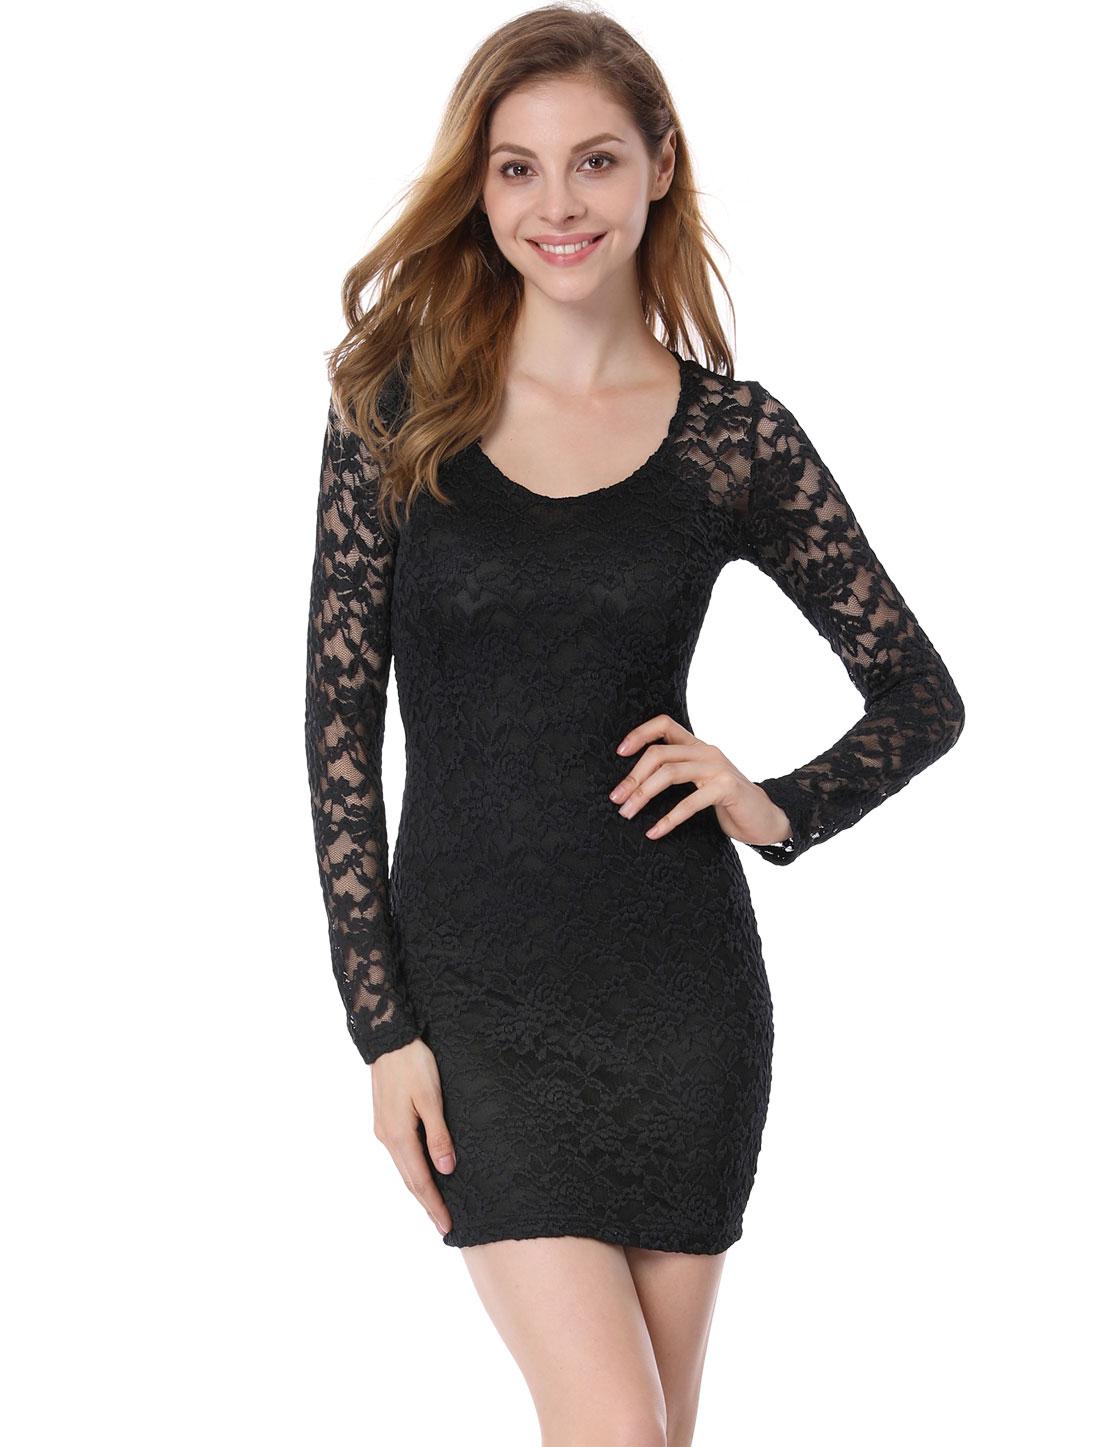 Women Chic All Over Crochet Lace Design Slim Fit Black Mini Dress L